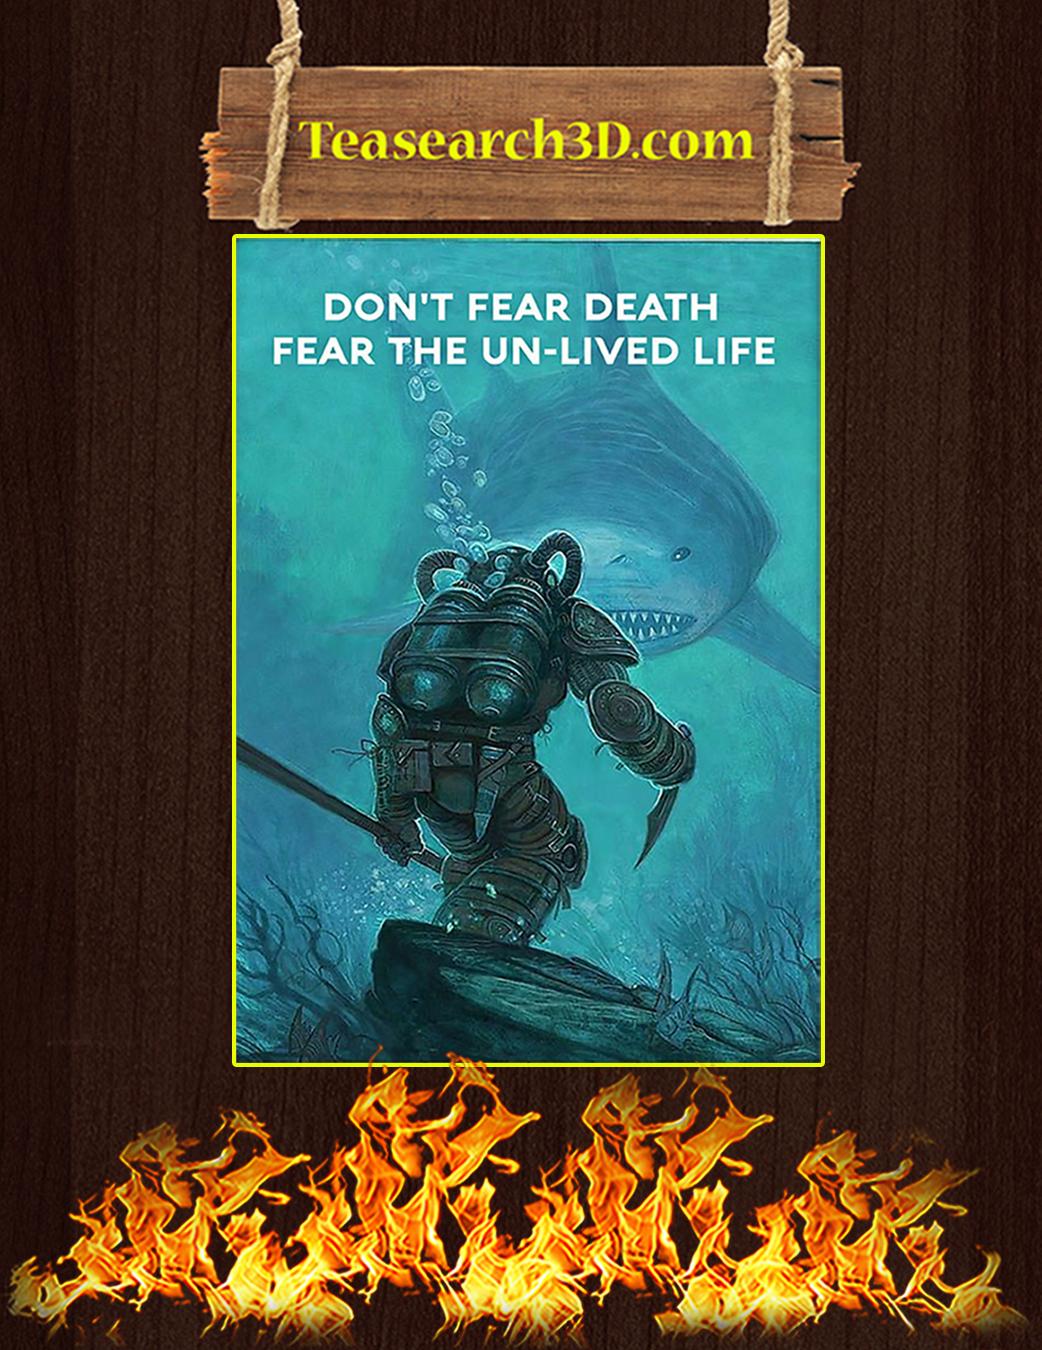 Scuba diving Don't fear death fear the un-lived life poster A1